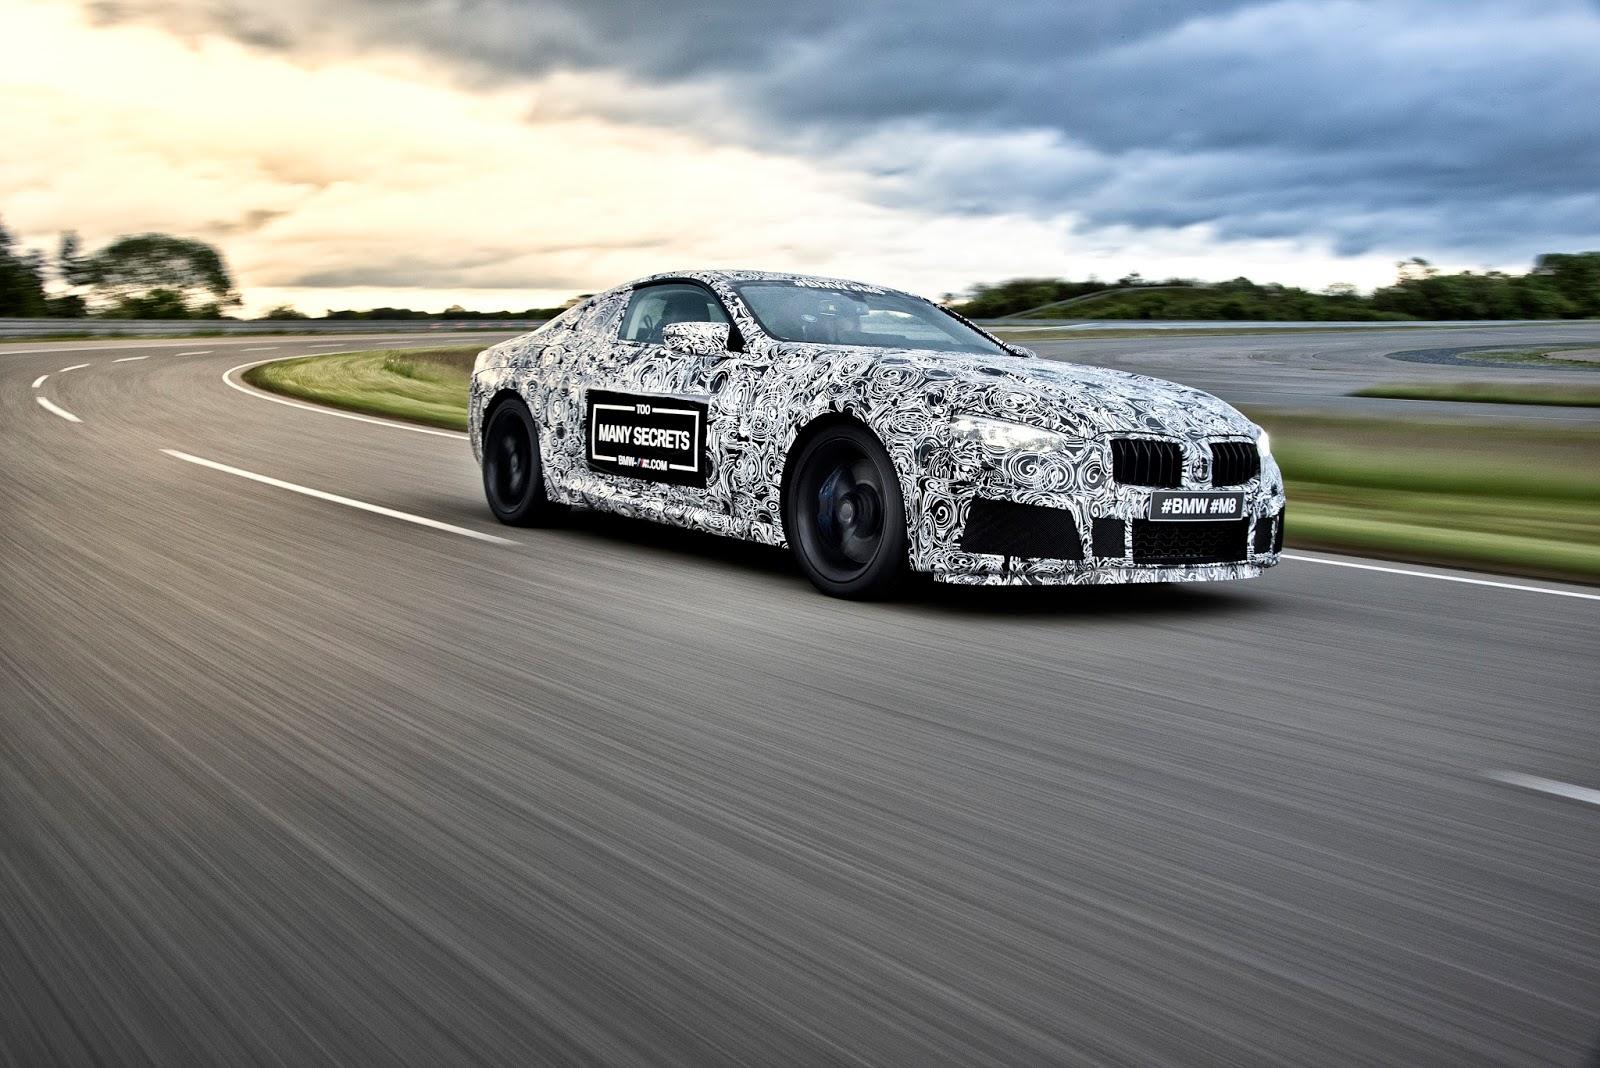 P90260947 highRes bmw m8 prototype 05 1 1 H ναυαρχίδα της BMW, η M8 θα είναι οκτακύλινδρη BMW, BMW Concept, BMW Concept 8 Series, BMW M, BMW M Performance, BMW M8